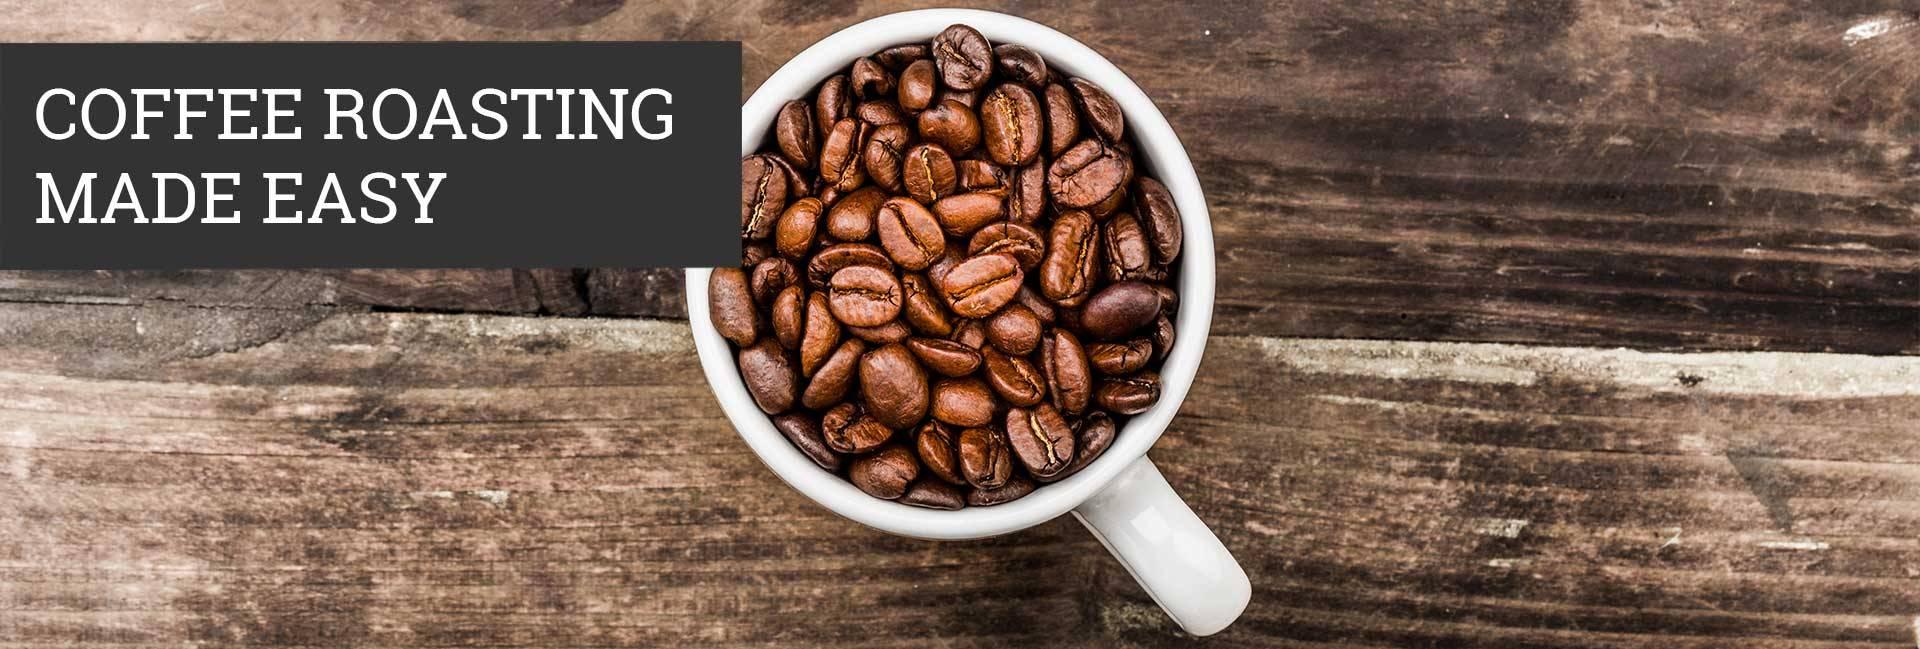 Home coffee roasting